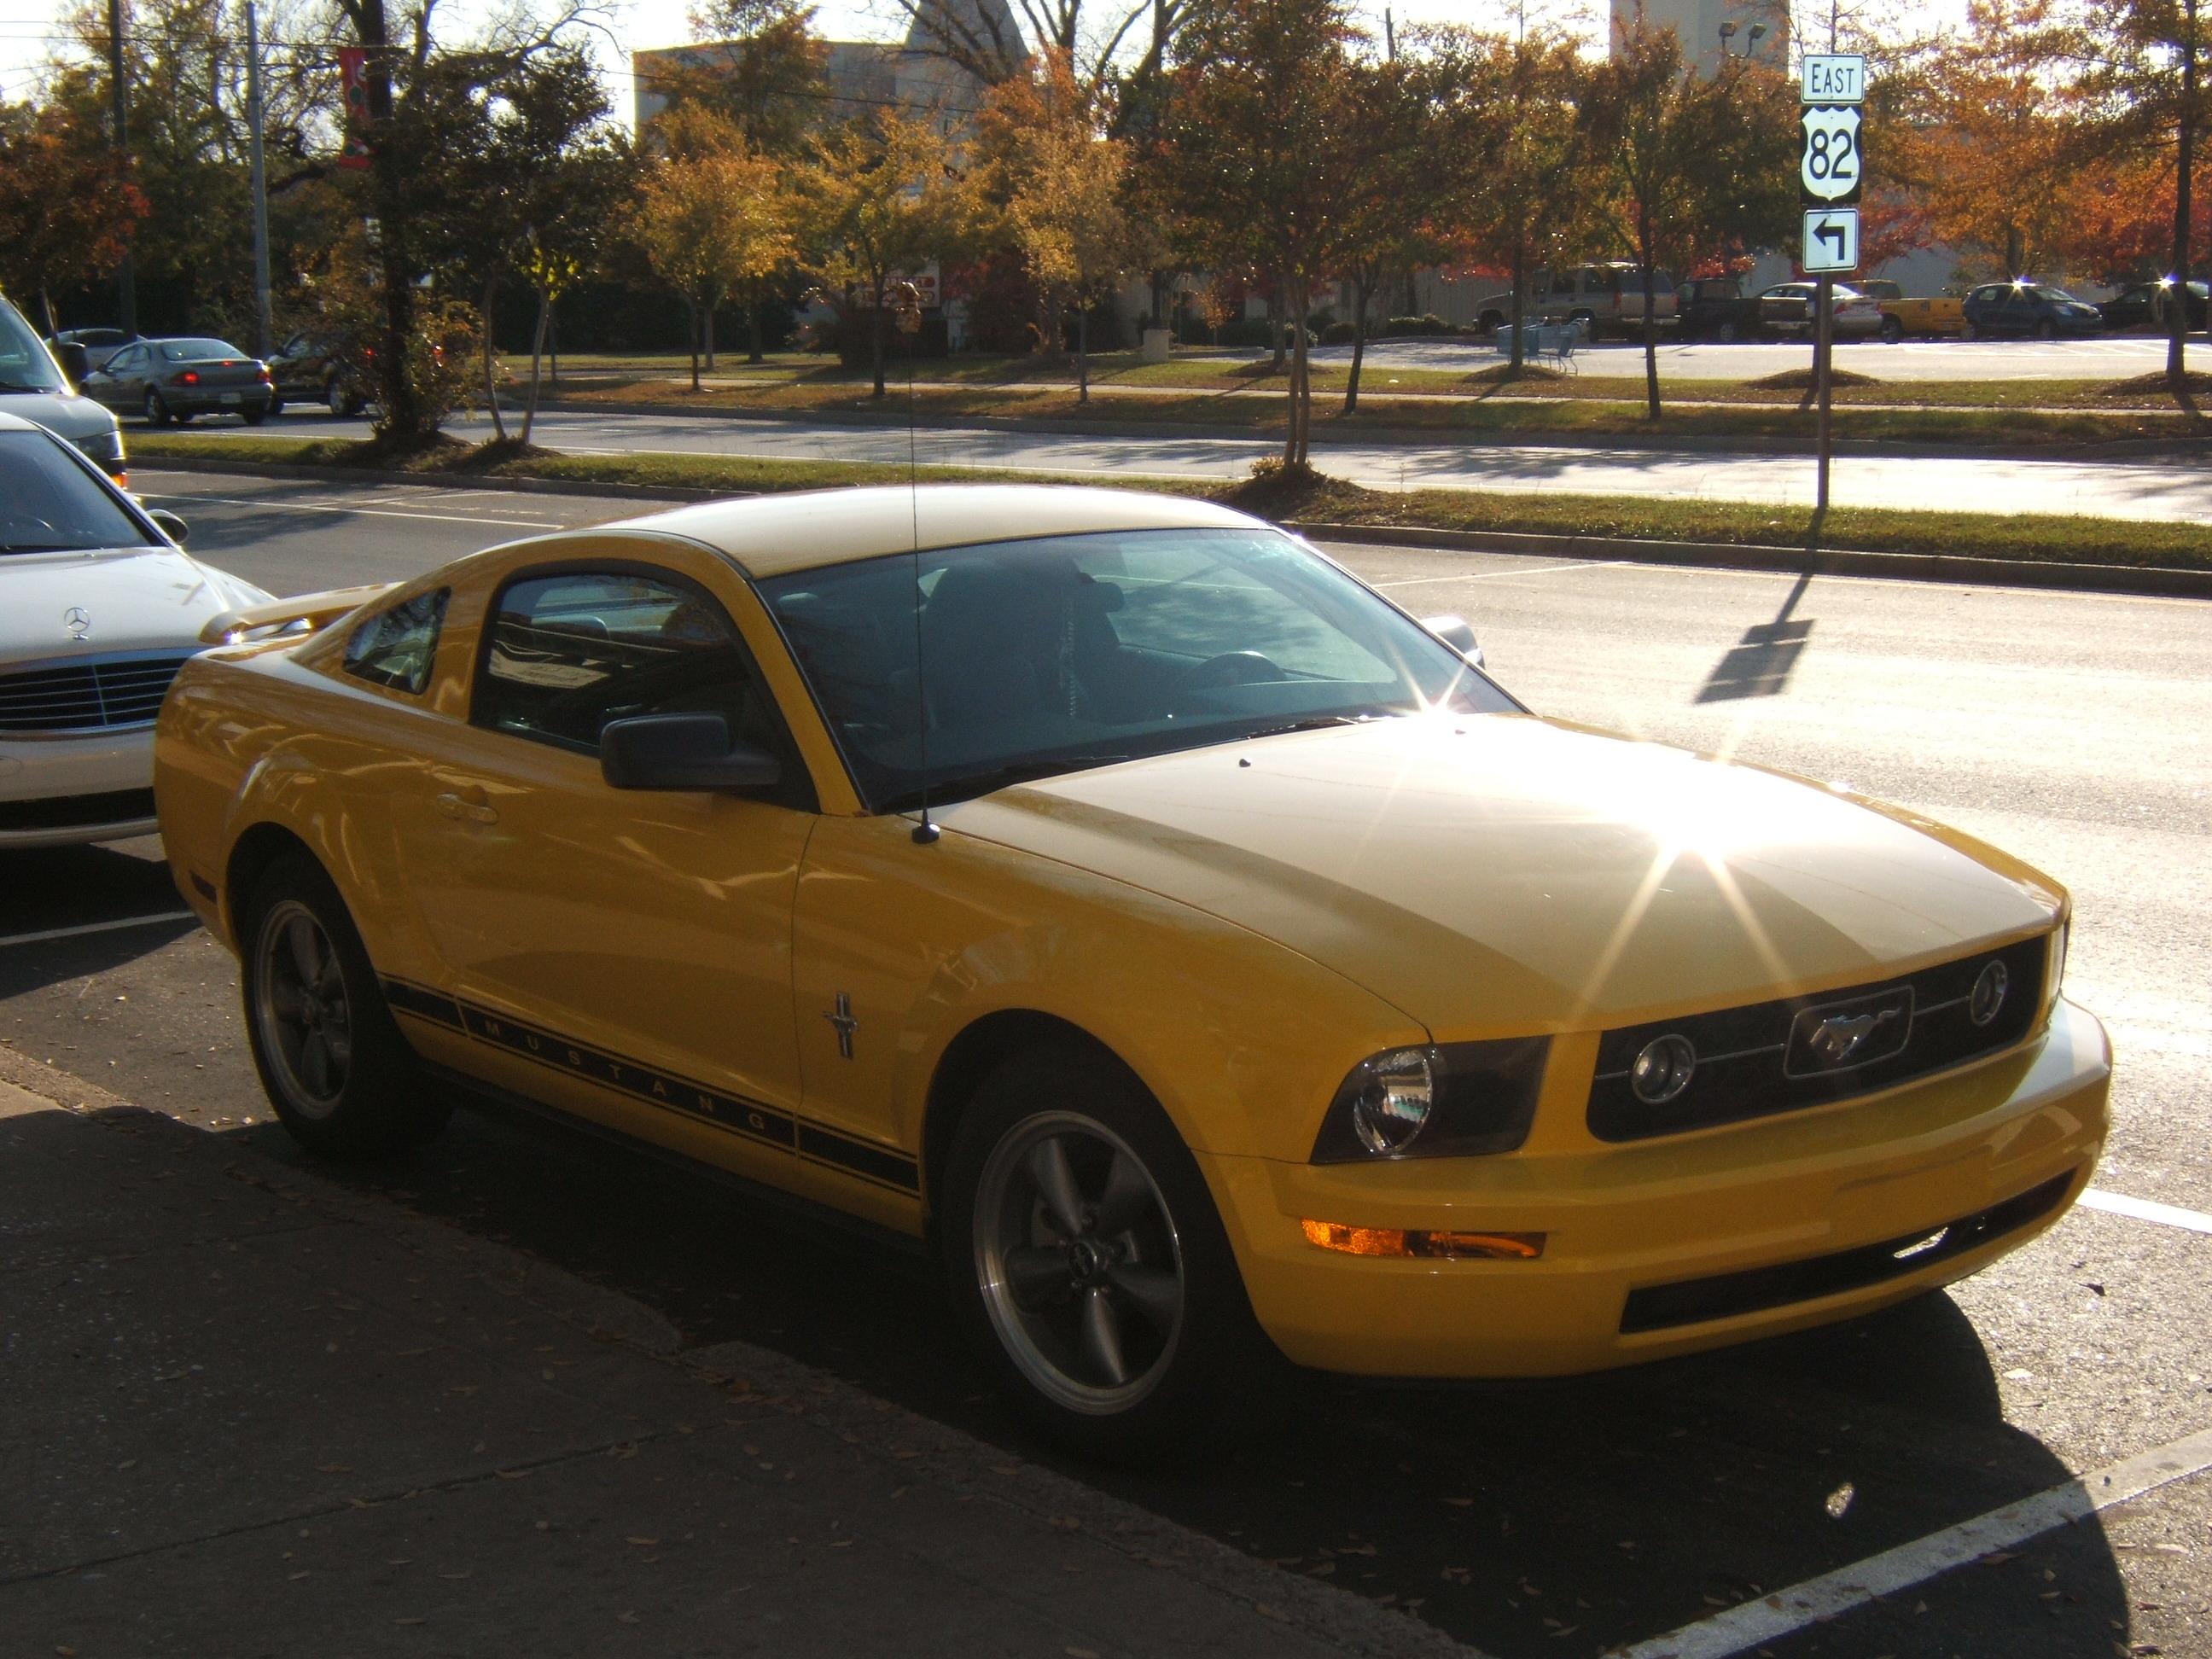 Ford Mustang Wikipedia Auto Design Tech